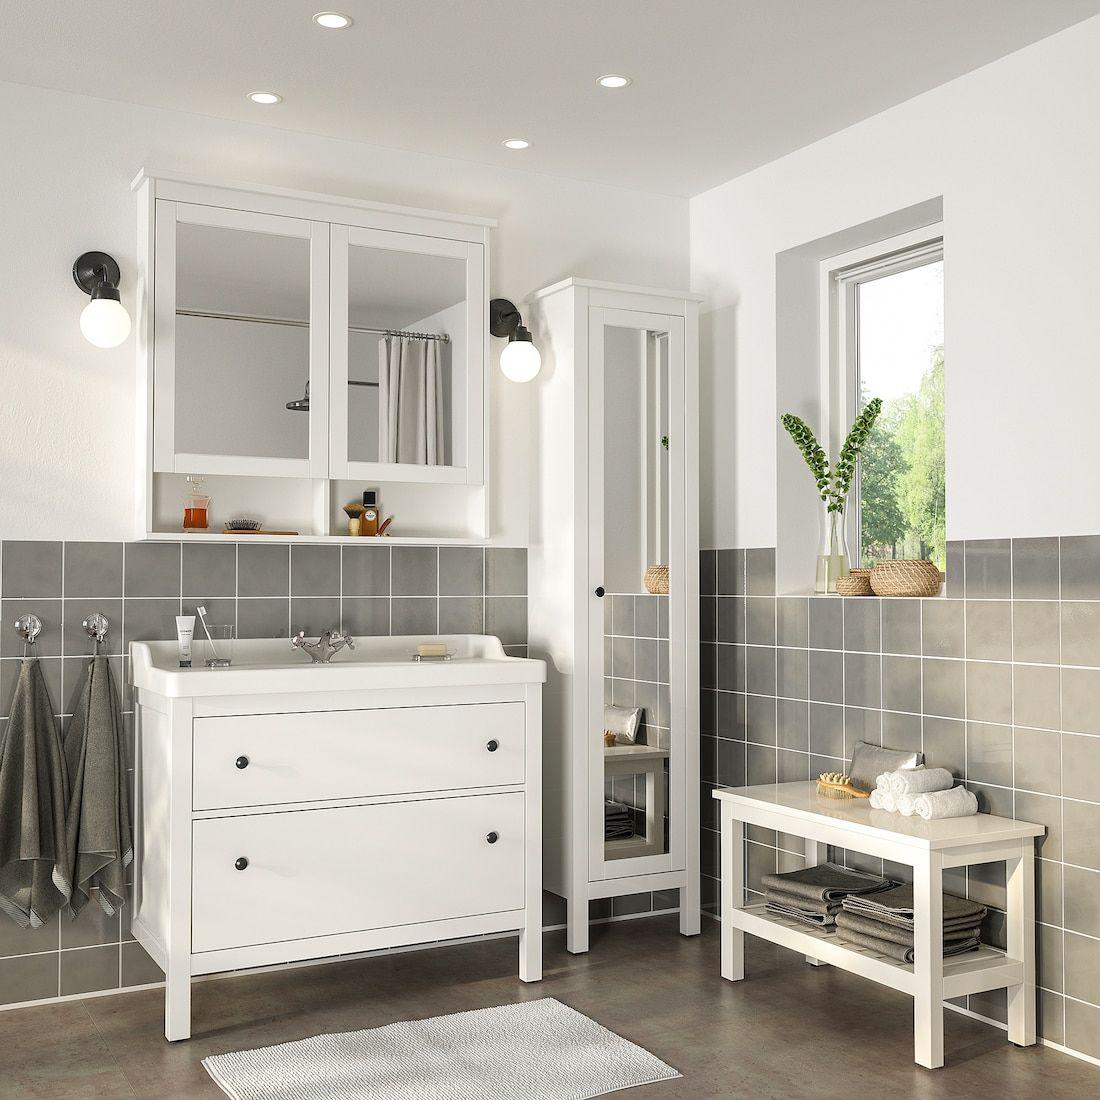 HEMNES / RÄTTVIKEN Bathroom furniture, set of 10, white, Runskär